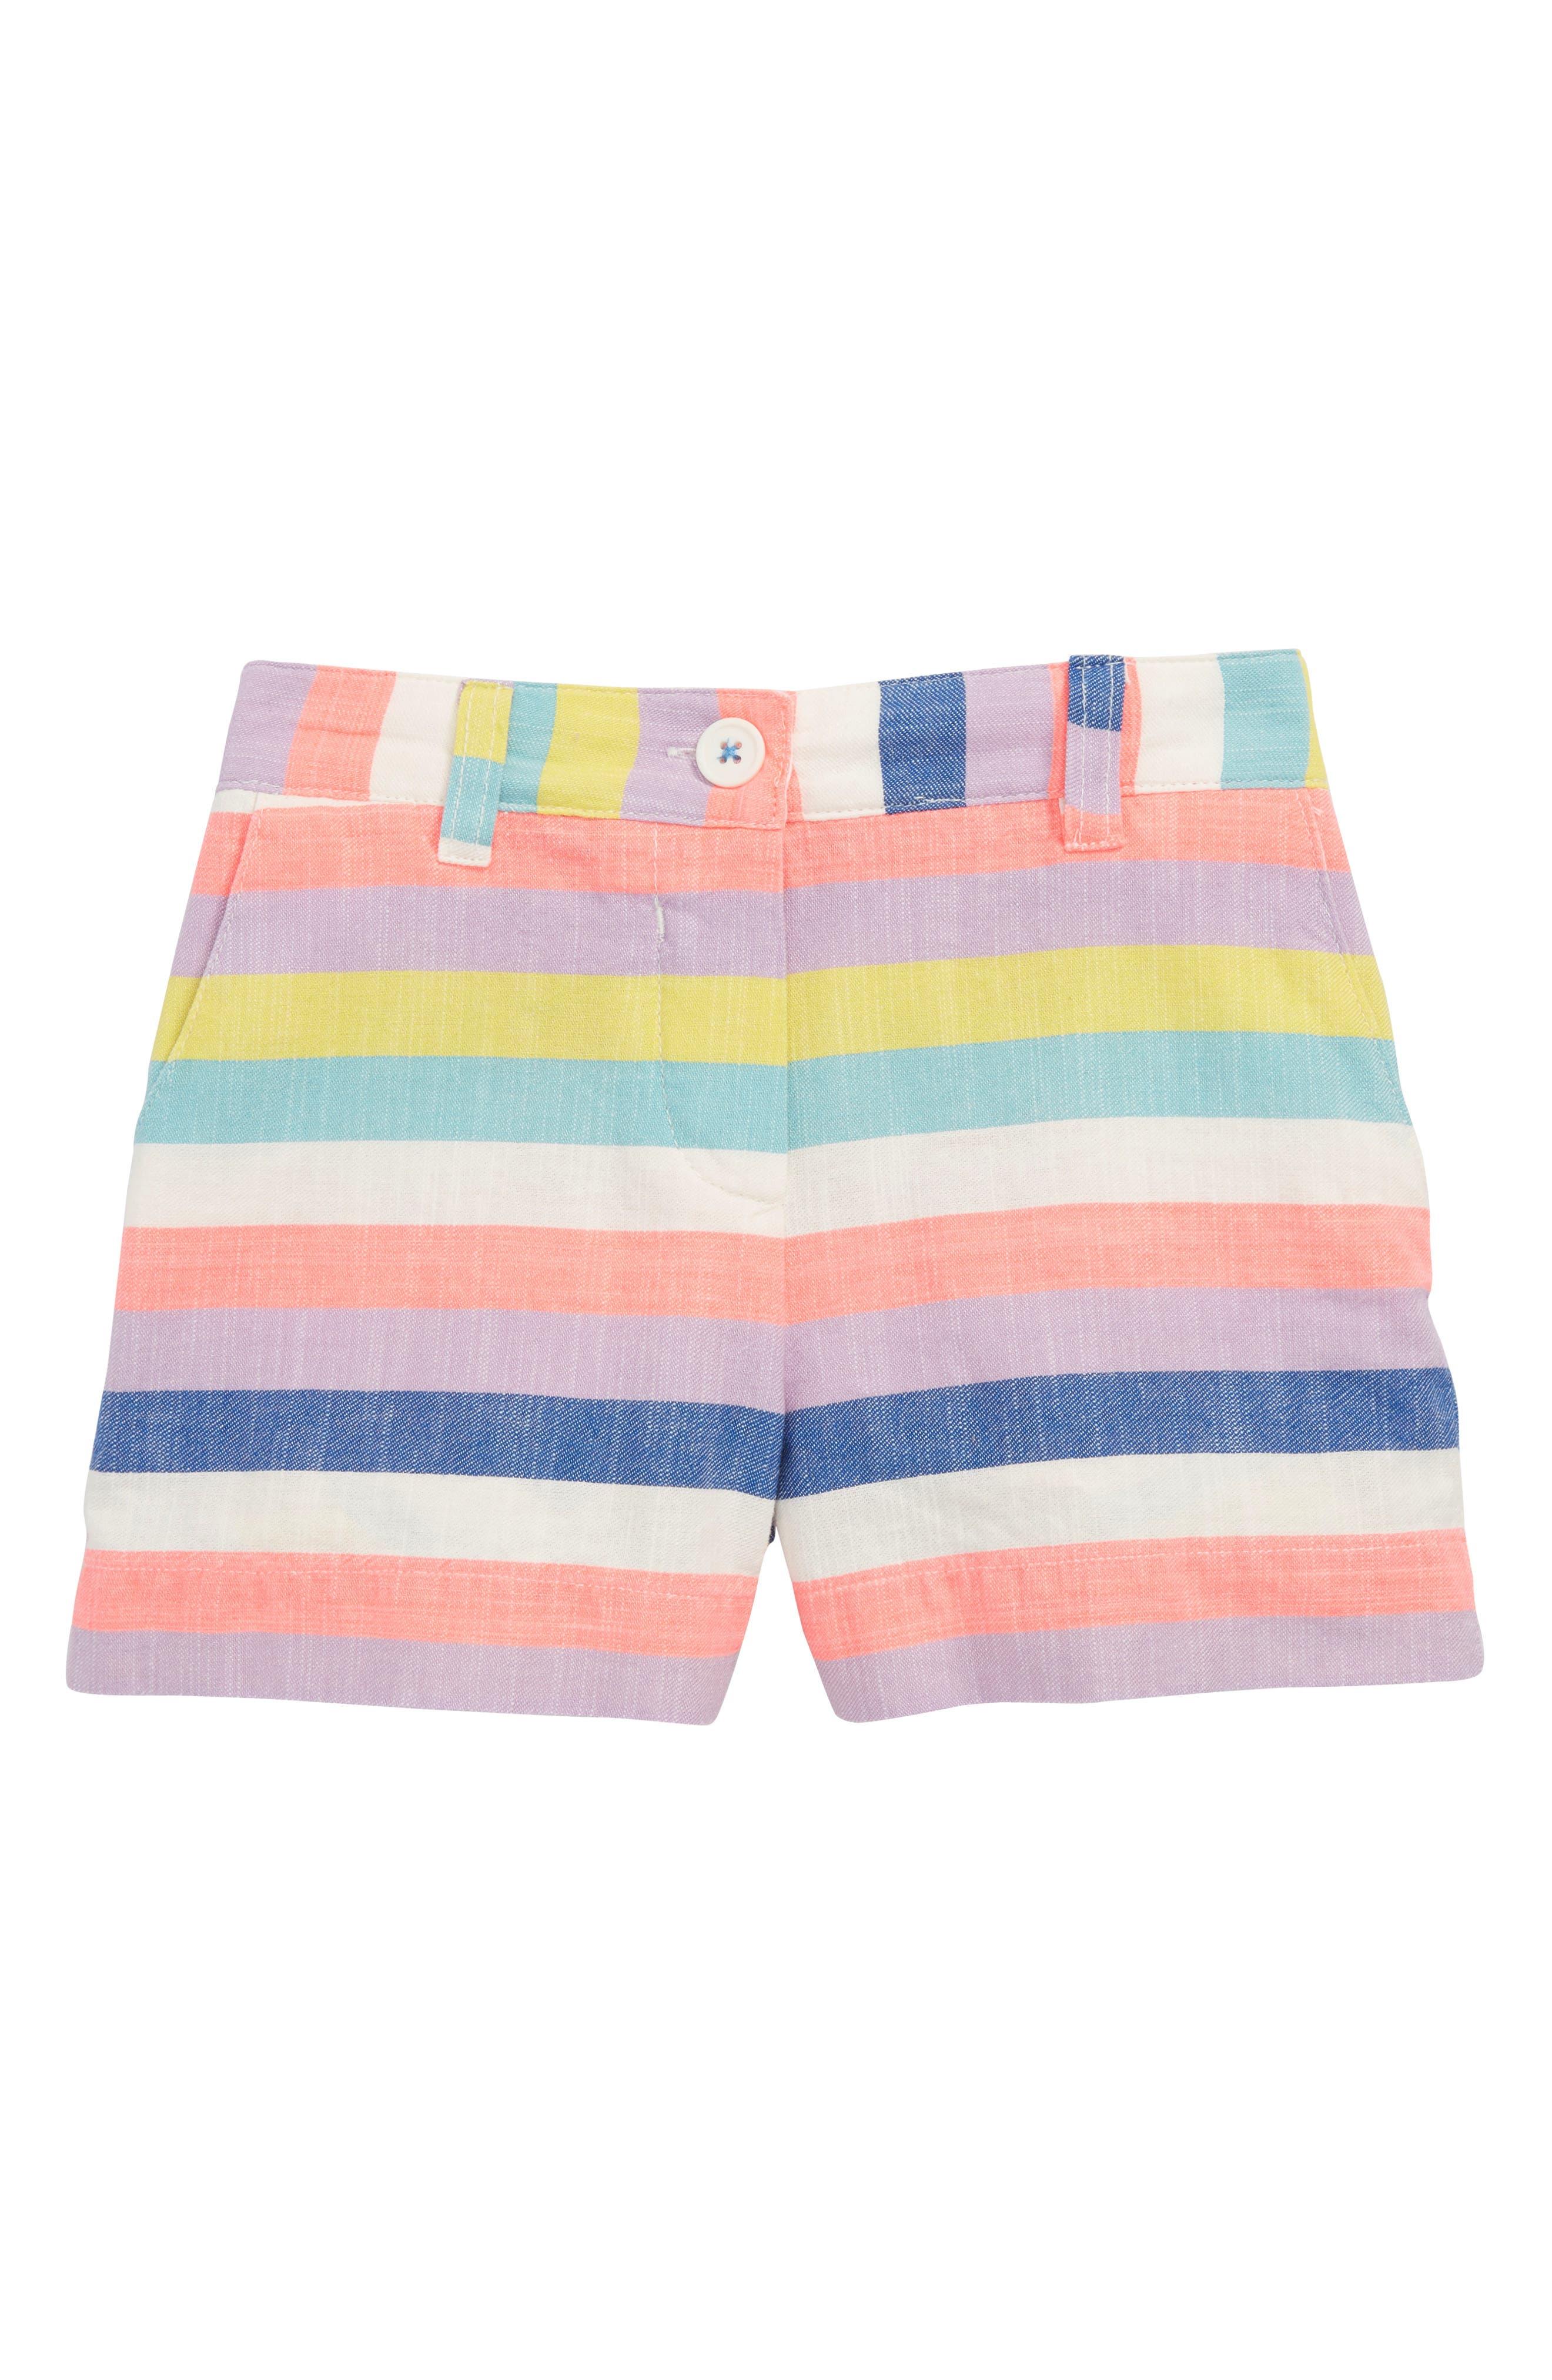 Bright Adventure Shorts,                             Main thumbnail 1, color,                             Candy Stripe Mul